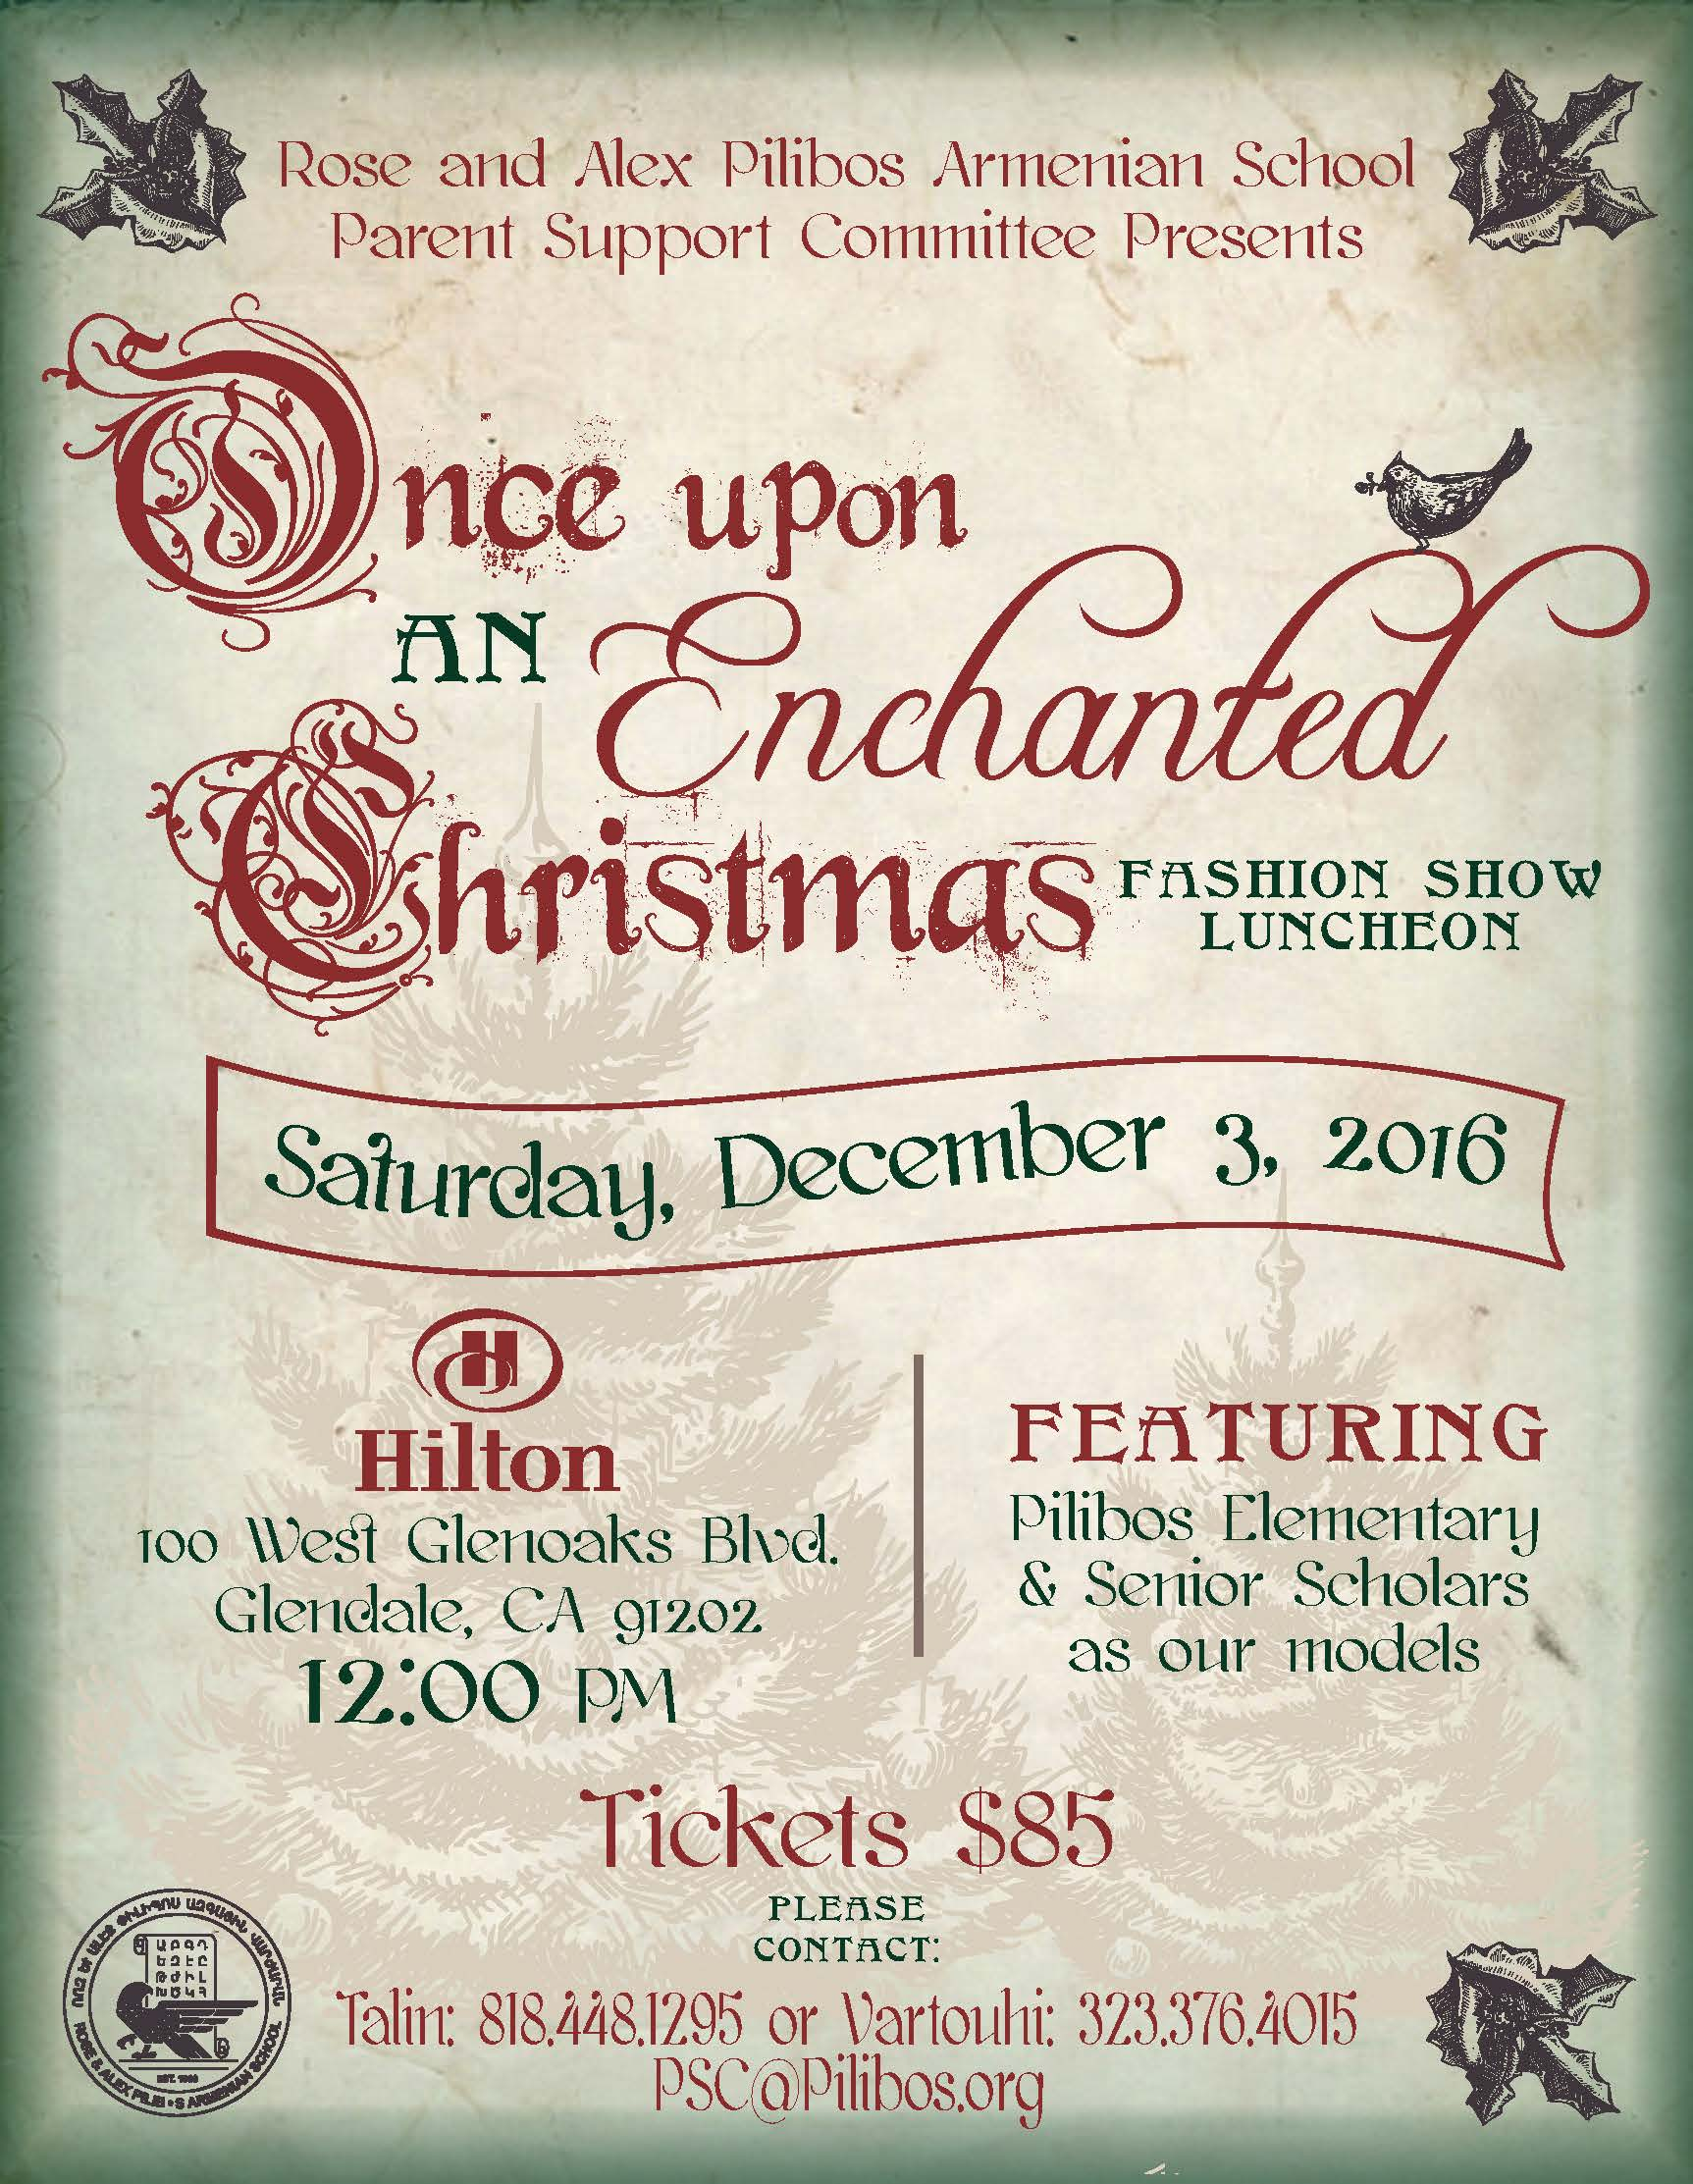 Christmas_Fashion_Show_Flyer.jpg